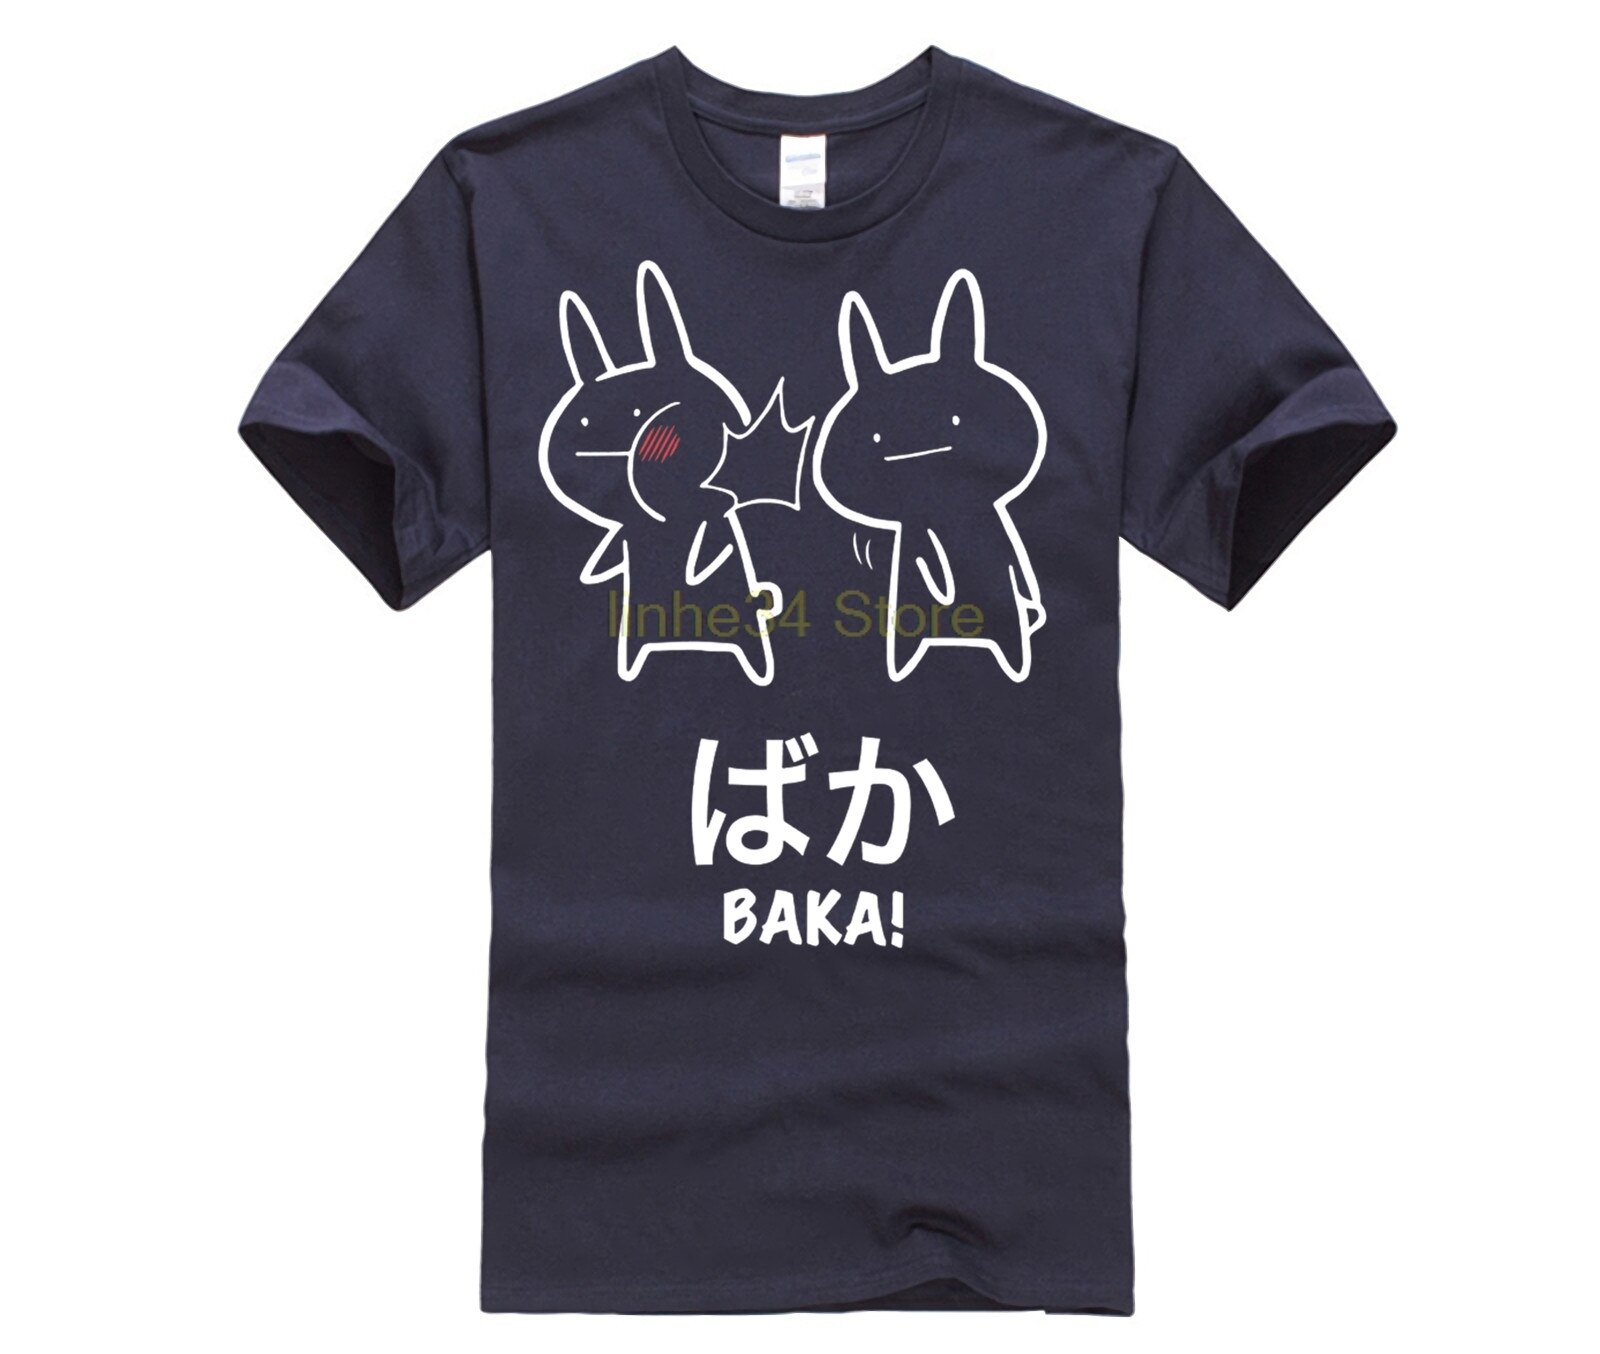 Divertido Anime Baka conejo Slap Shirt-Baka japonés Tee novedad Cool tapas hombres Camiseta de manga corta Camiseta